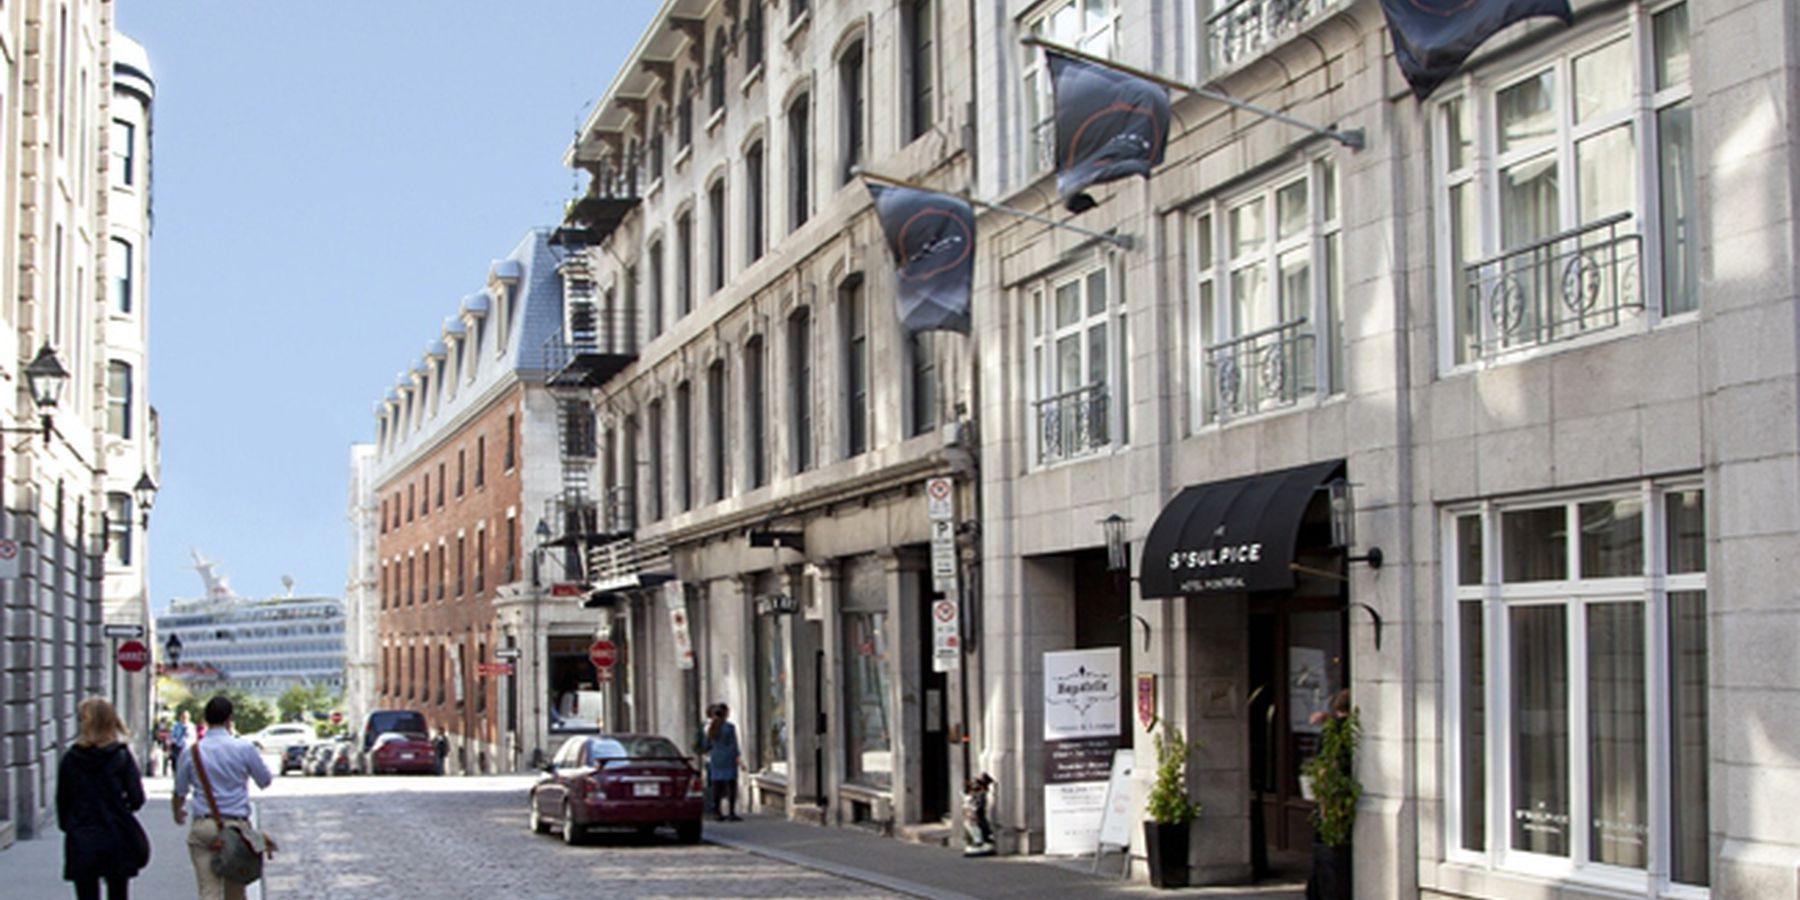 Le Saint Sulpice Hotel Montreal - buiten2